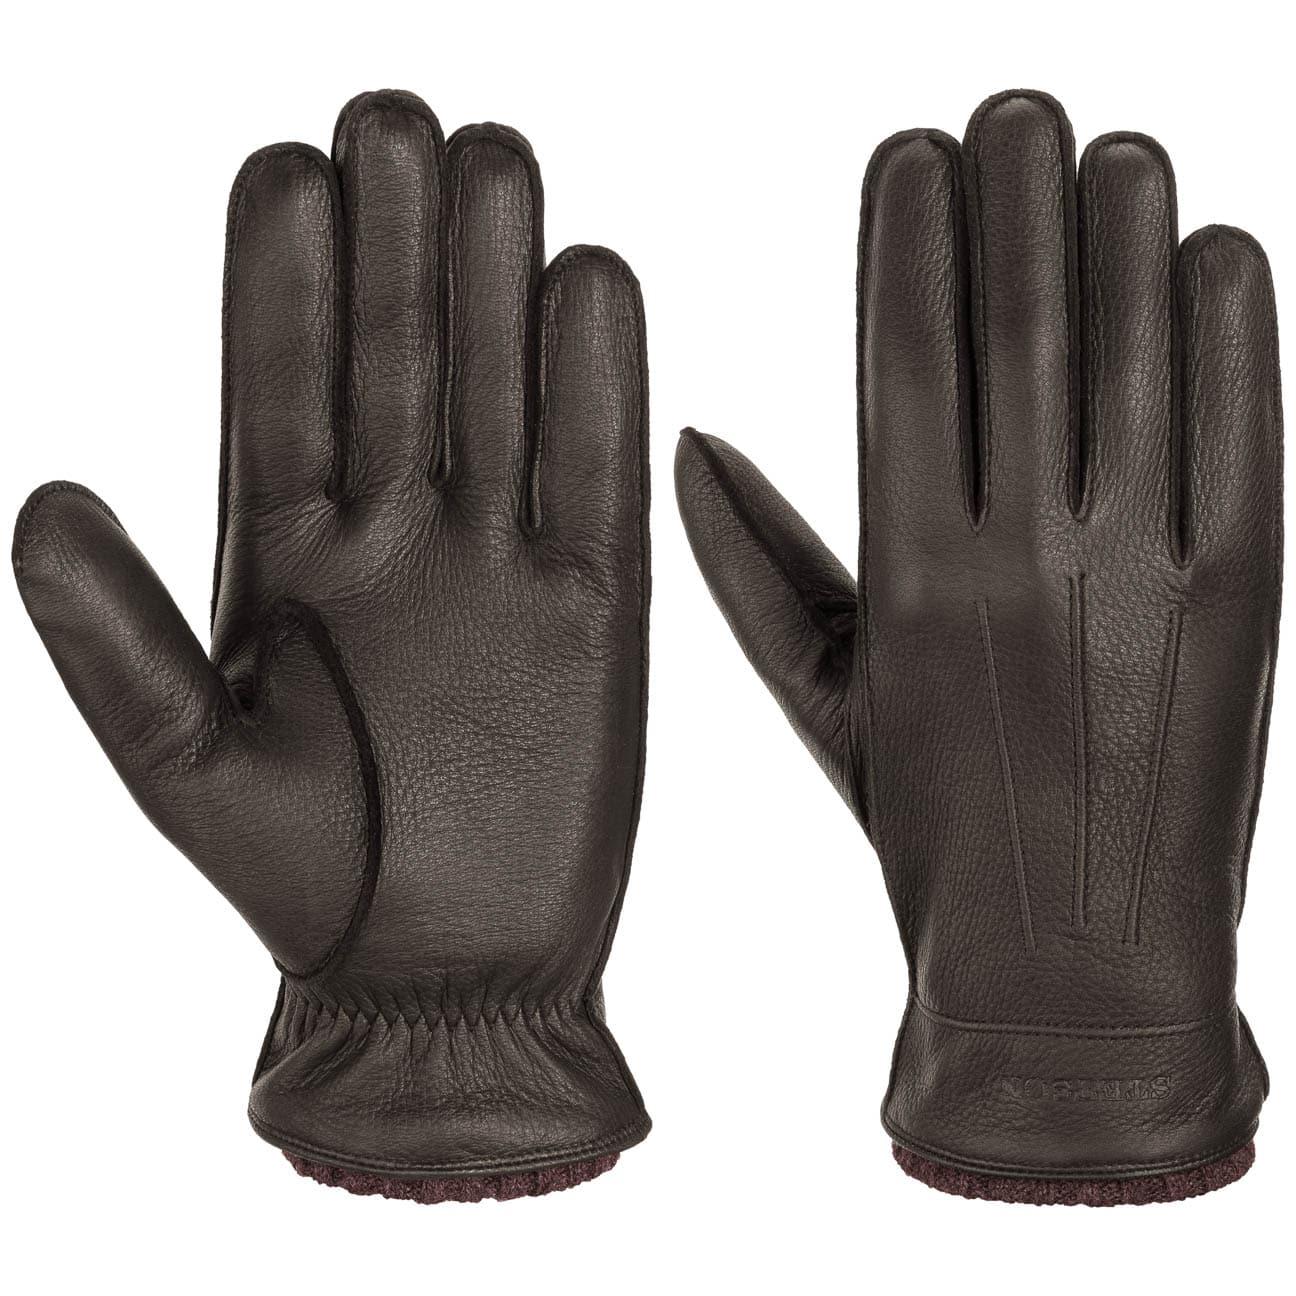 deer-cashmere-lederhandschuhe-by-stetson-herrenhandschuhe